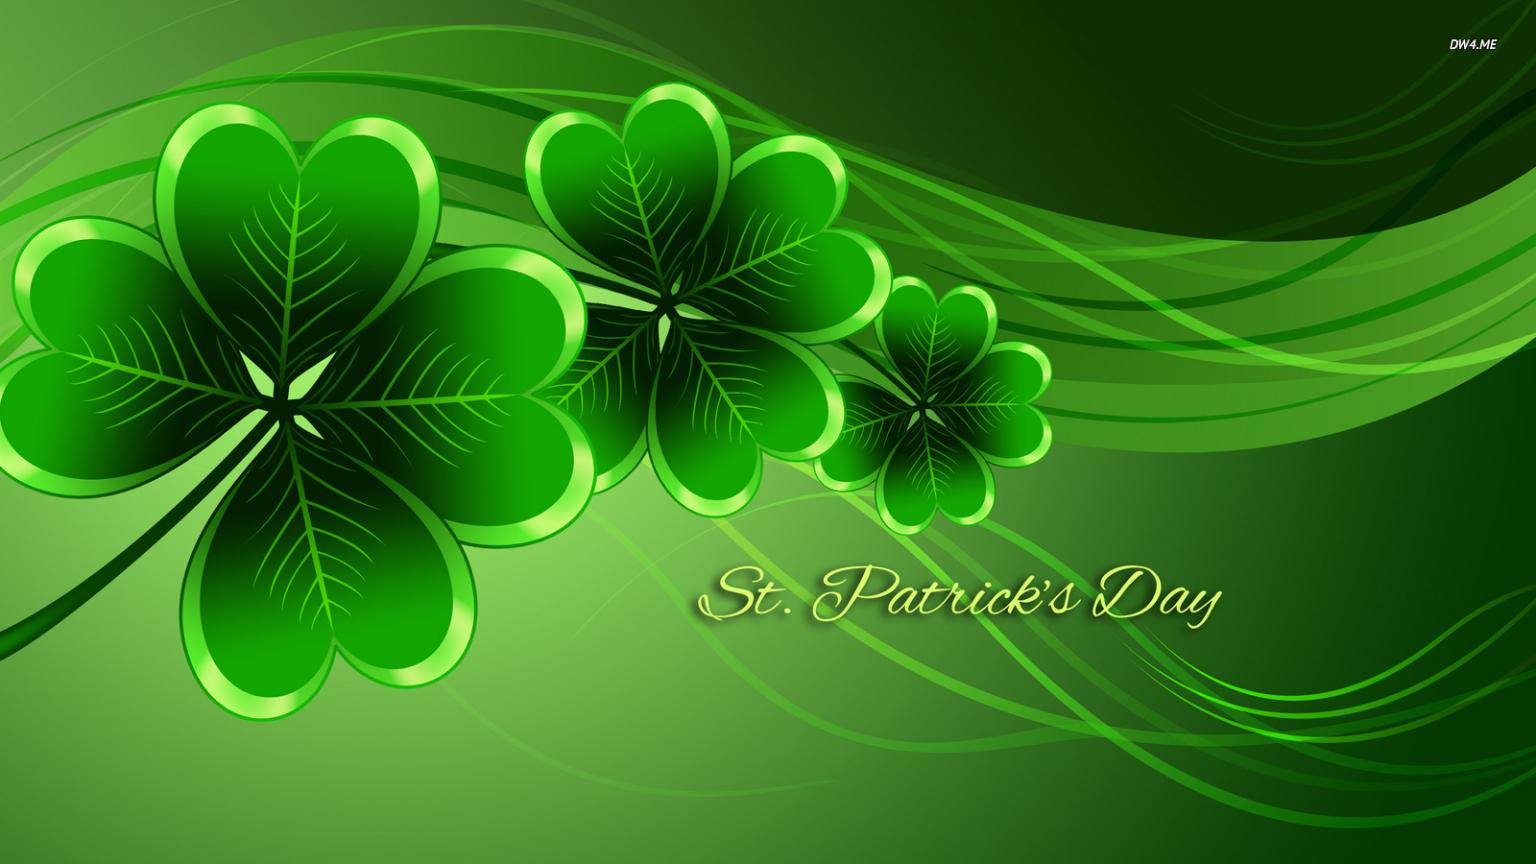 Free Download Saint Patricks Day Wallpaper Holiday Wallpapers 2159